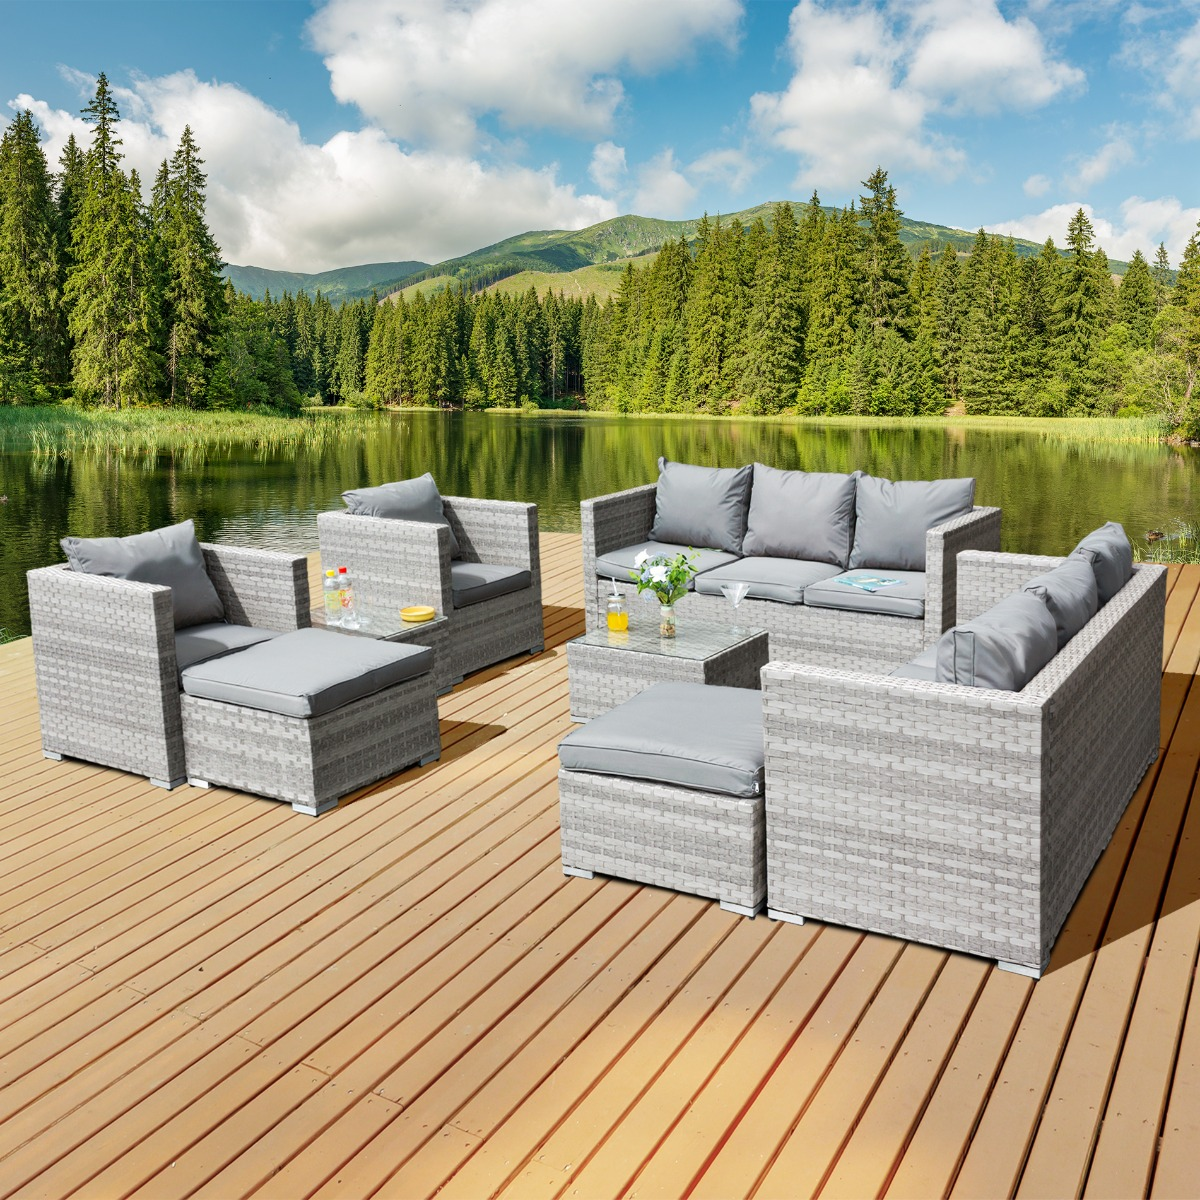 Acorn Deluxe Rattan 10 Seat Modular Sofa Set in Dove Grey